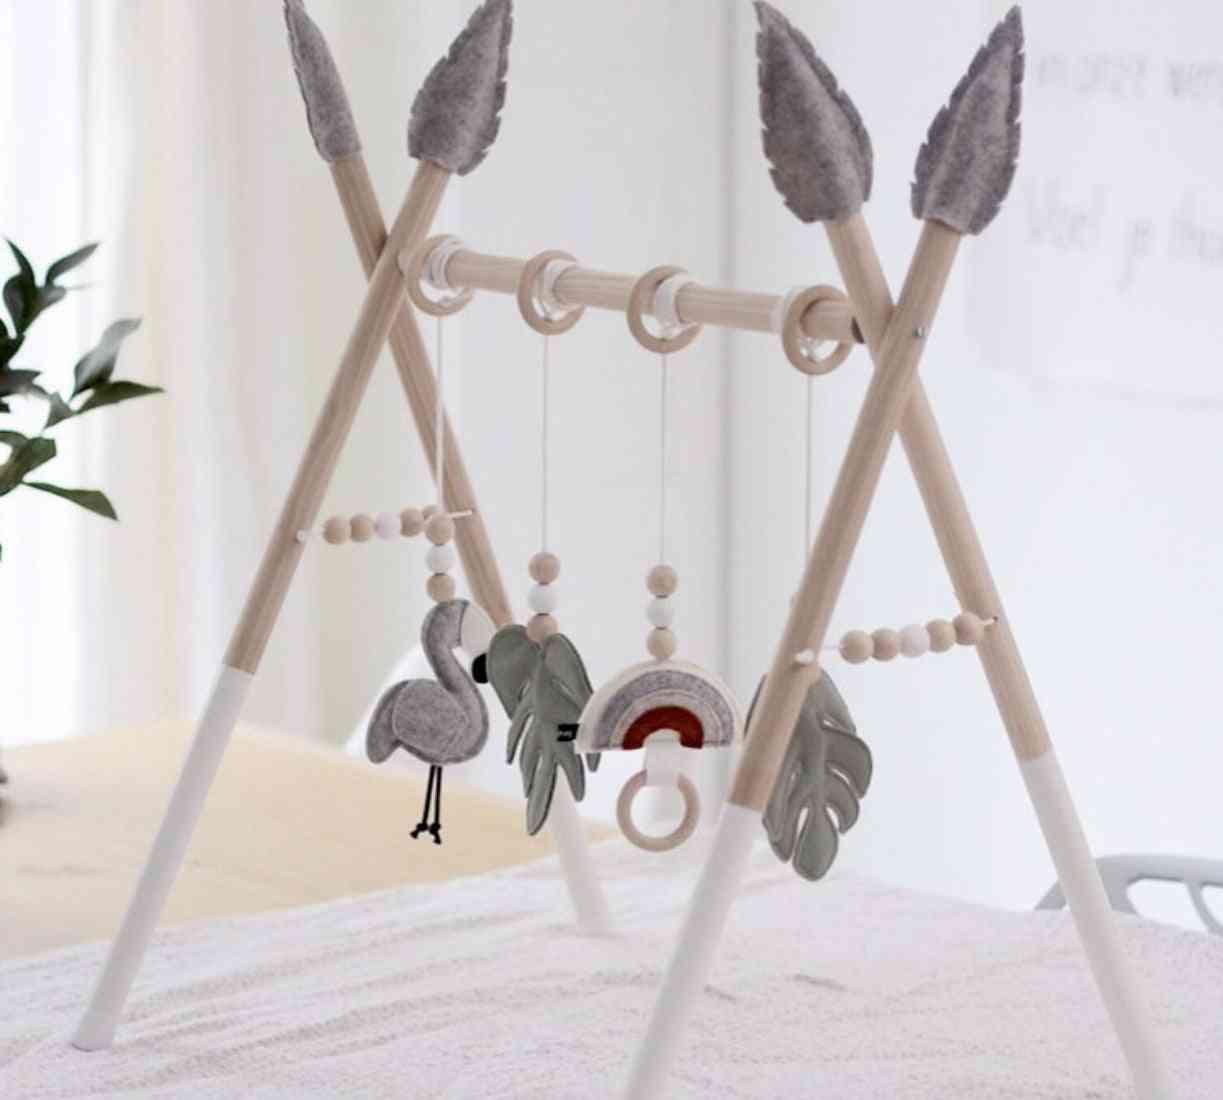 Baby Gym Play Nursery Sensory Ring Pull - Fitness Frame Toy